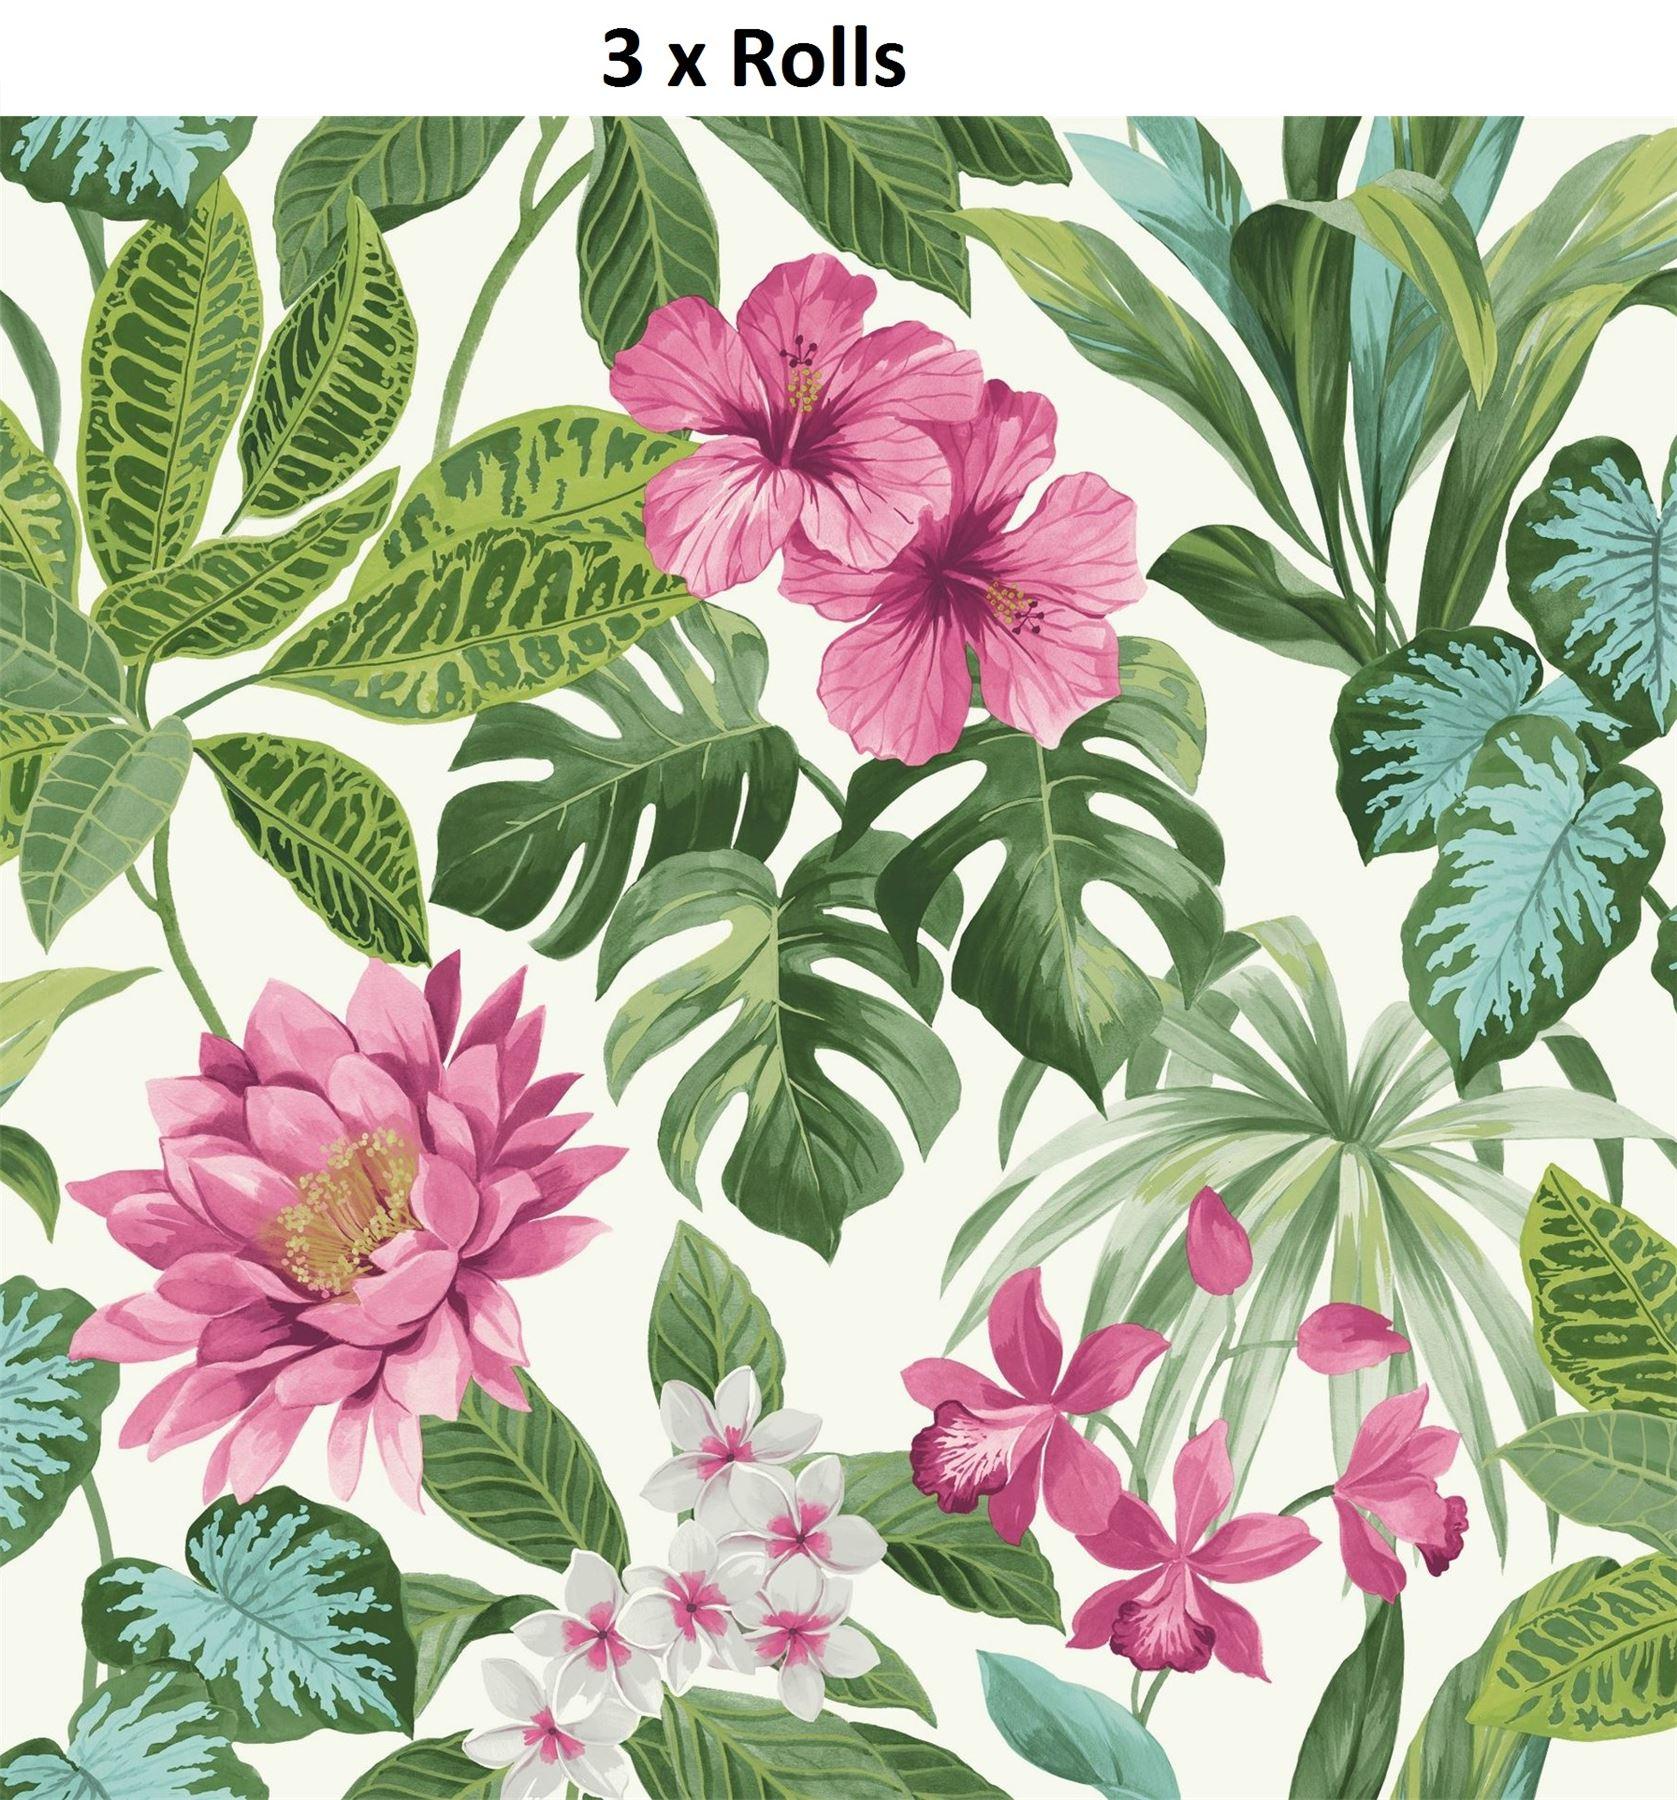 3 X Tropical Palm Leaf Floral Wallpaper Rainforest Flower Green